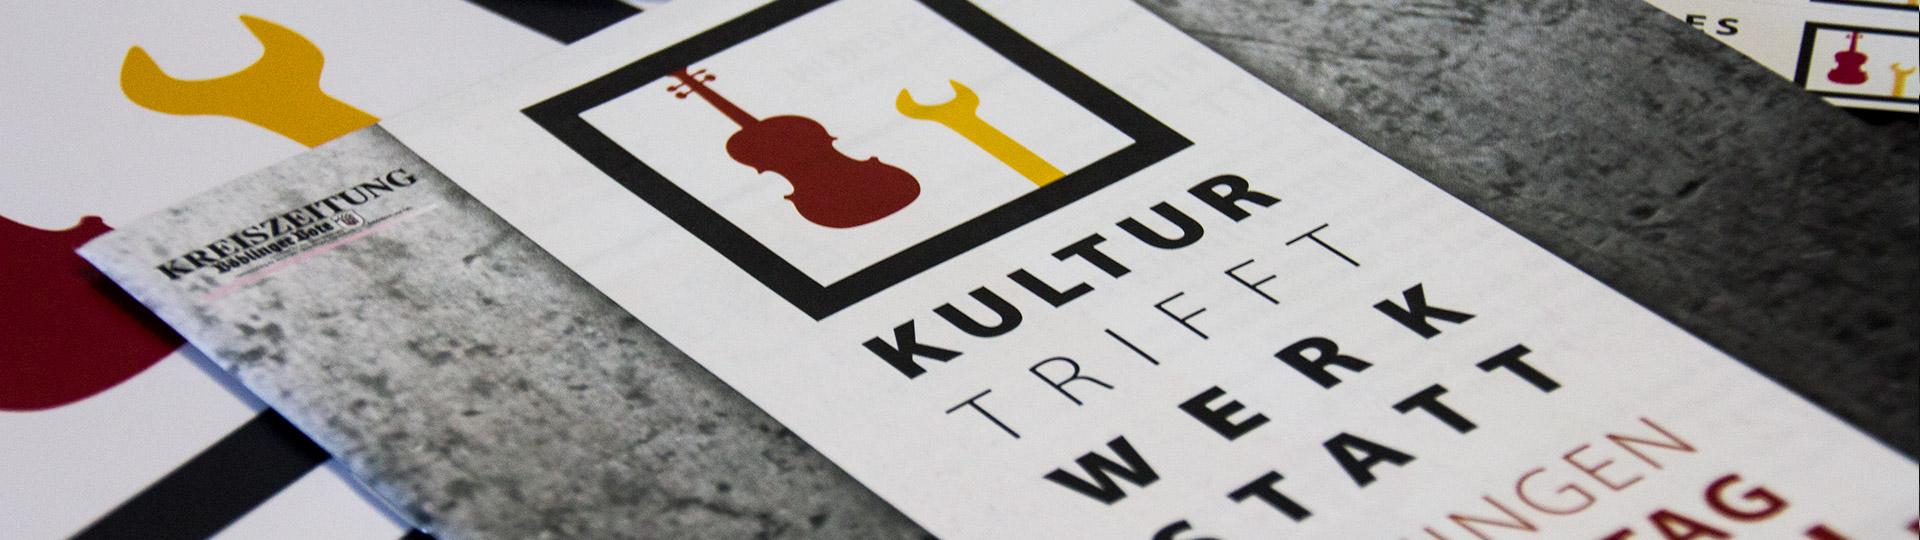 GHV Ehningen Kultur trifft Werkstatt Programm